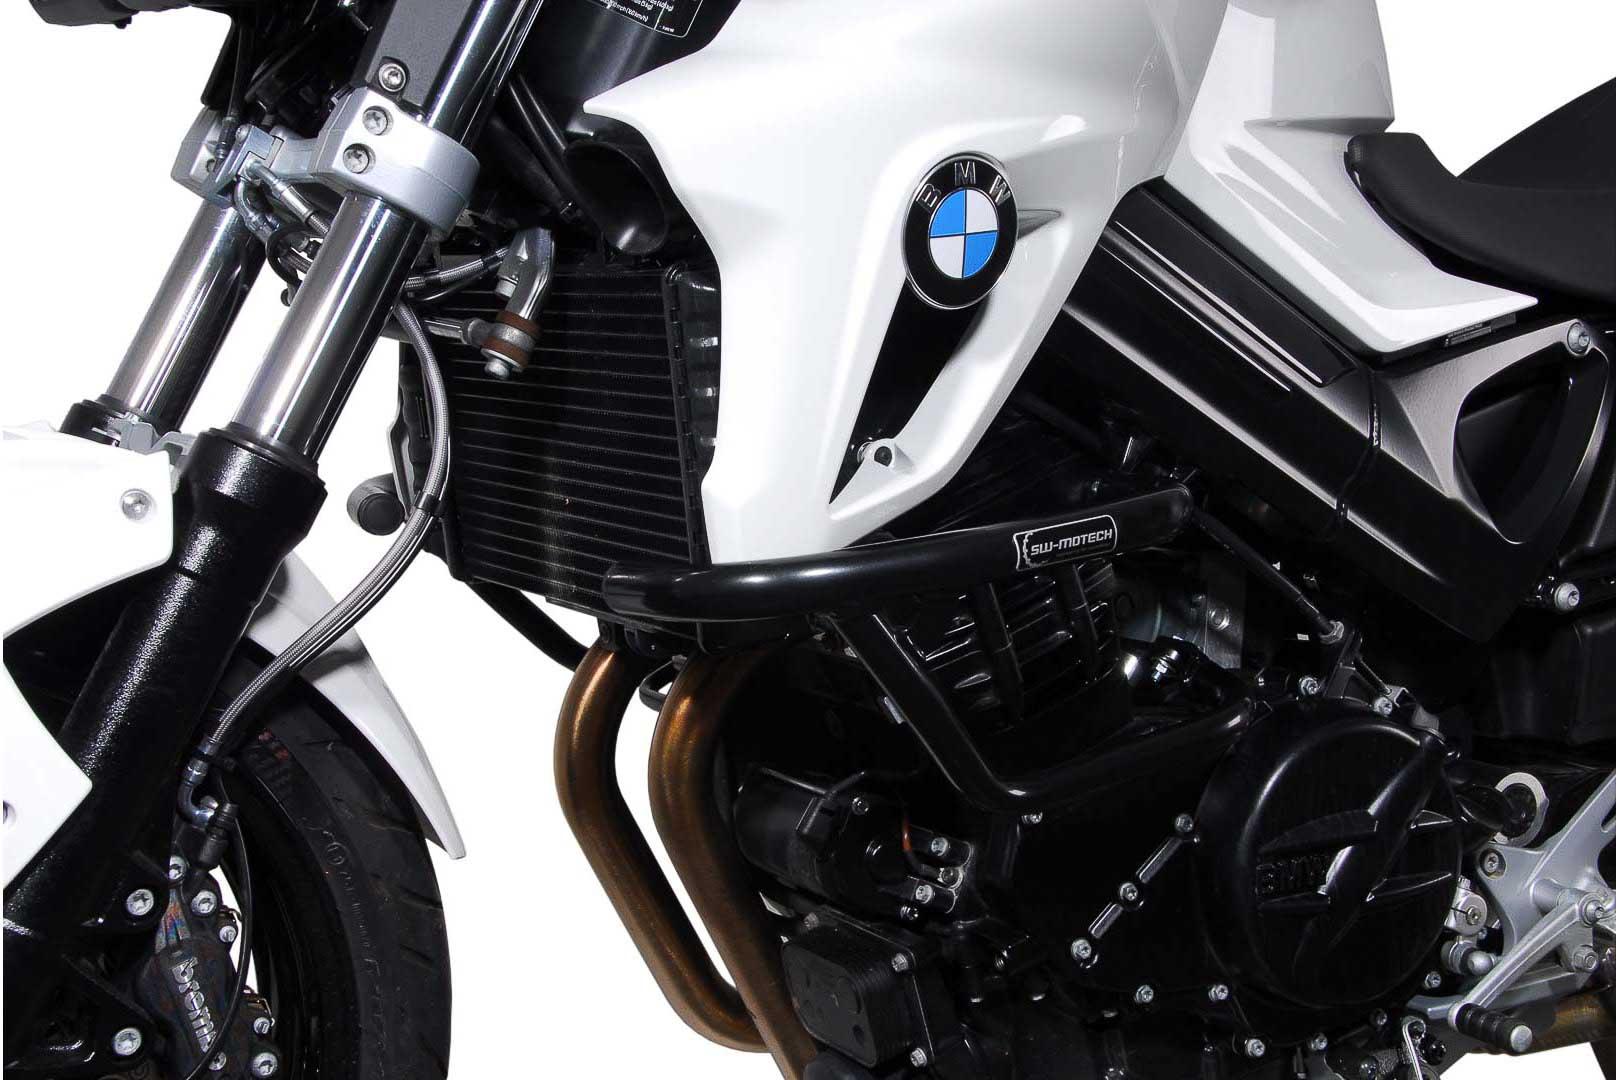 SW-Motech Moottorinsuojarauta BMW F800S/F800R musta